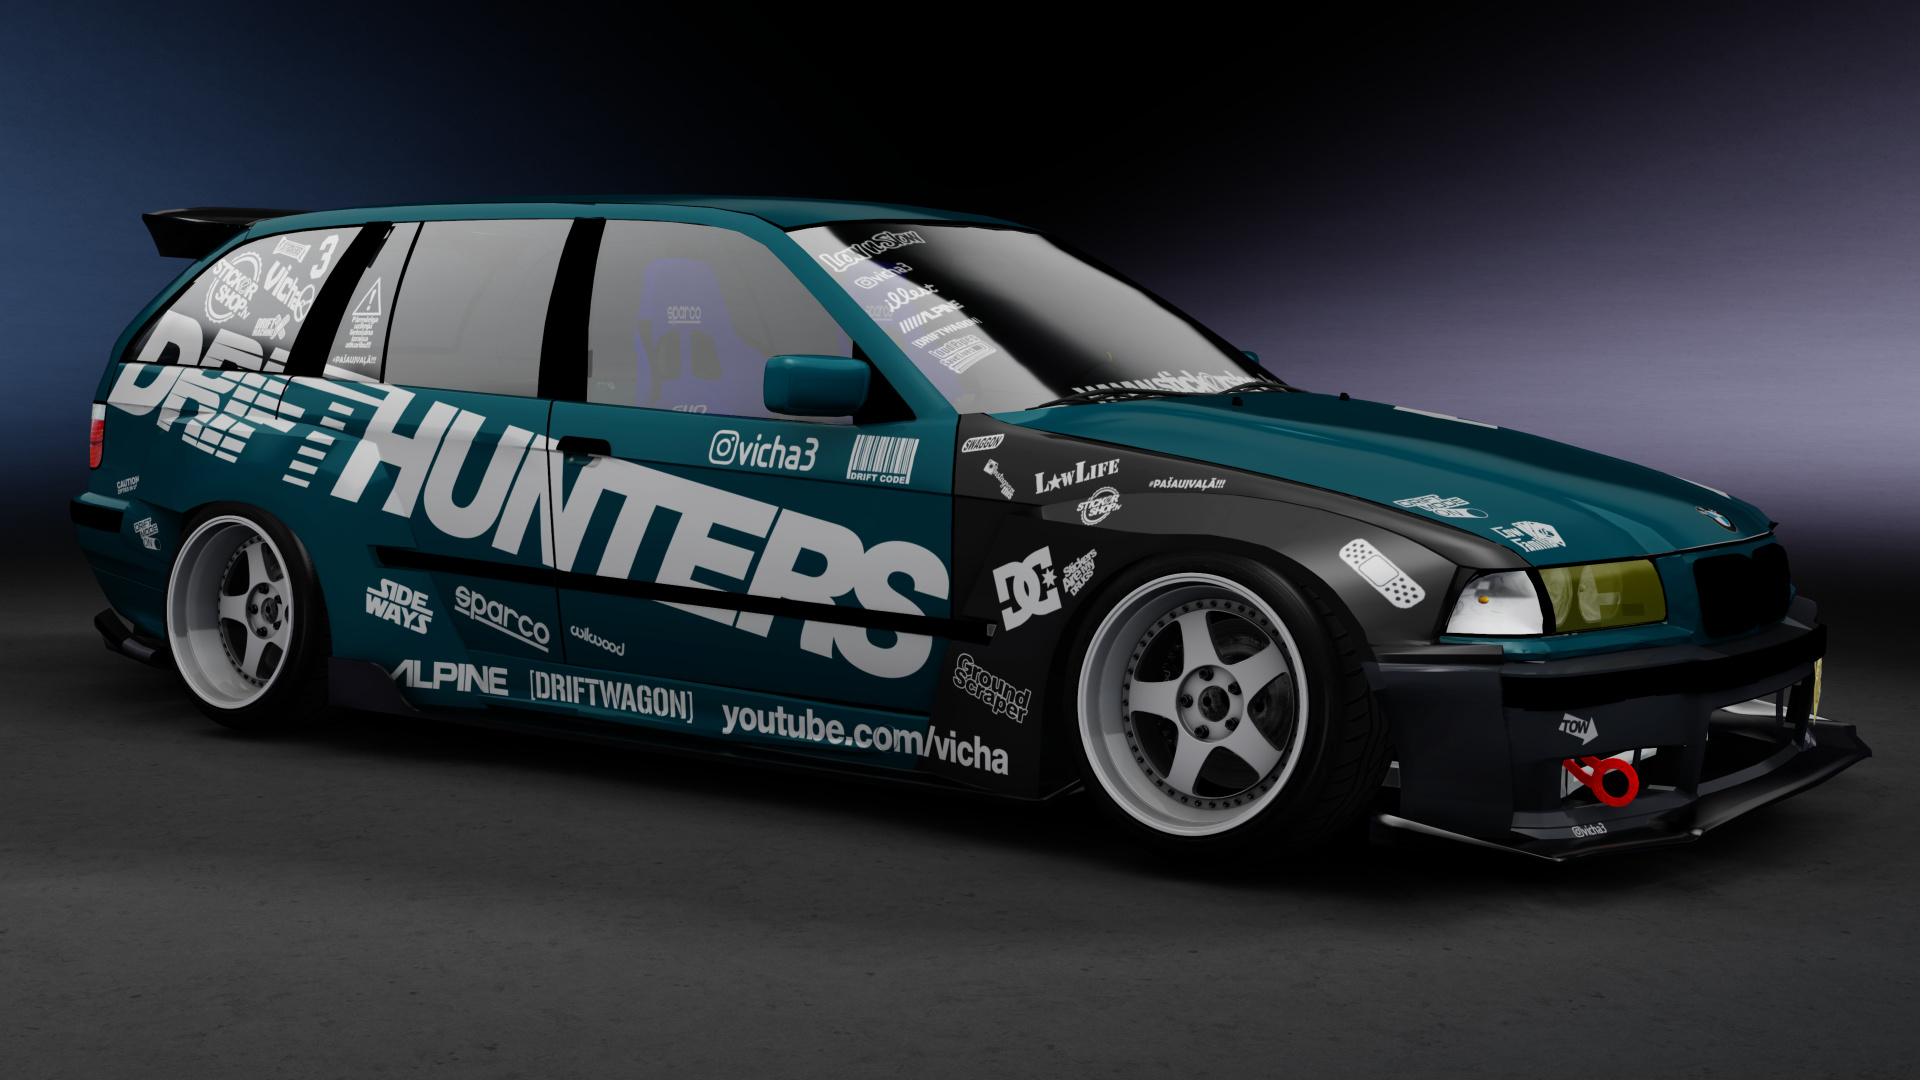 Bmw E36 Touring Vicha Racedepartment